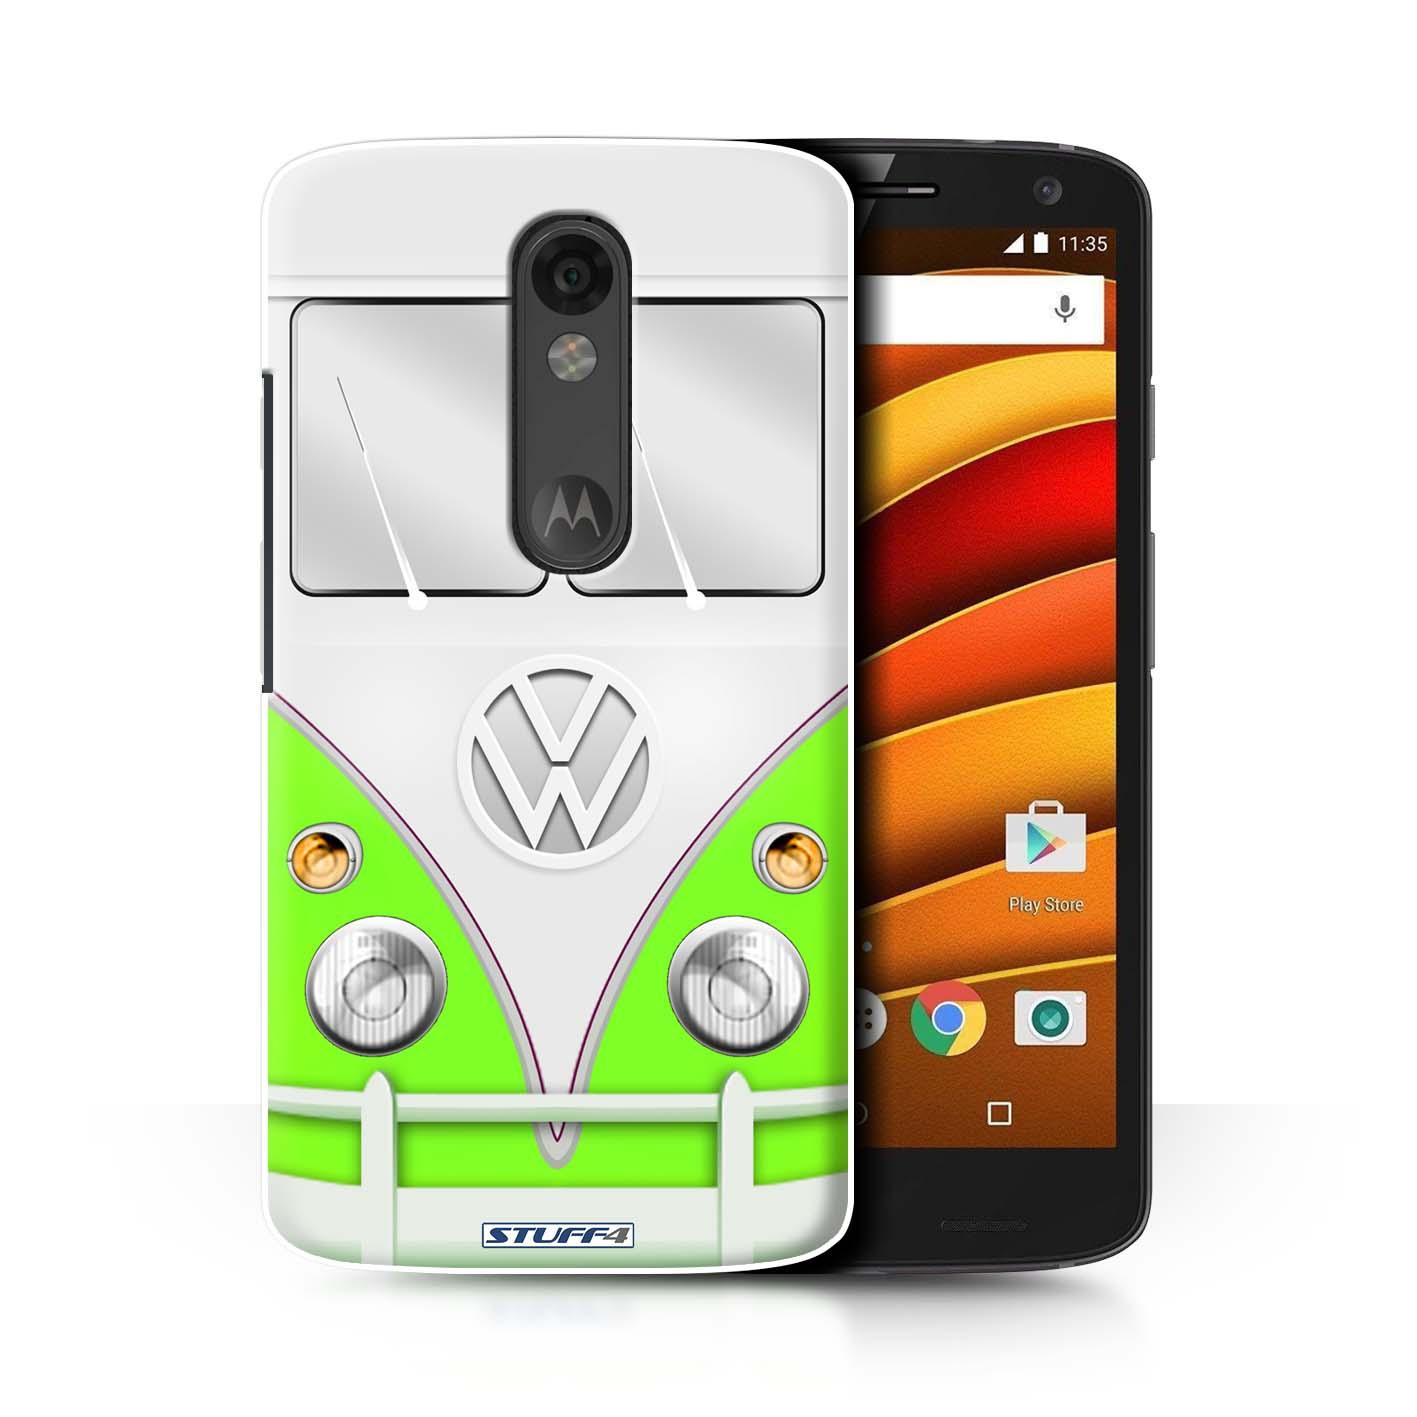 Stuff4-Funda-para-telefono-Motorola-E-amp-GB-Smartphone-VW-Camper-Van-PROTECTORA